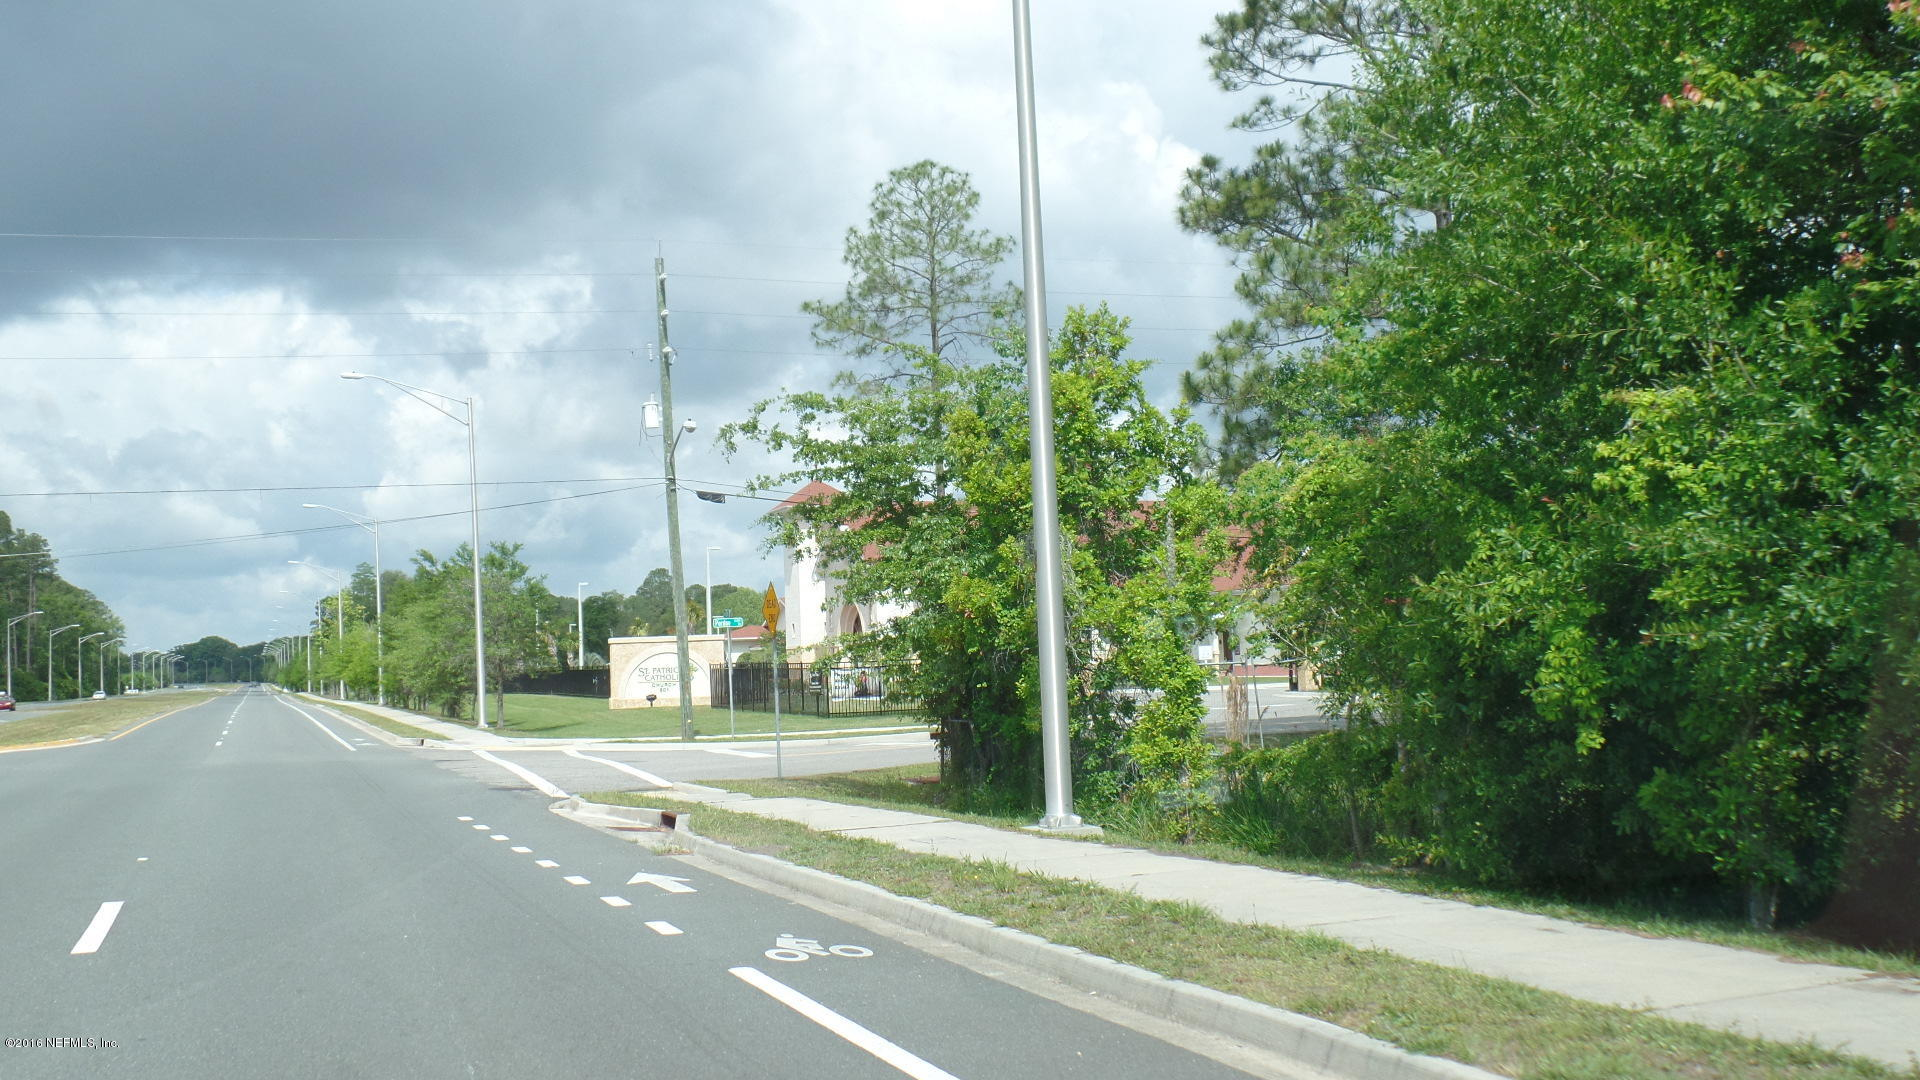 13283 PERDUE, JACKSONVILLE, FLORIDA 32218, ,Commercial,For sale,PERDUE,854800